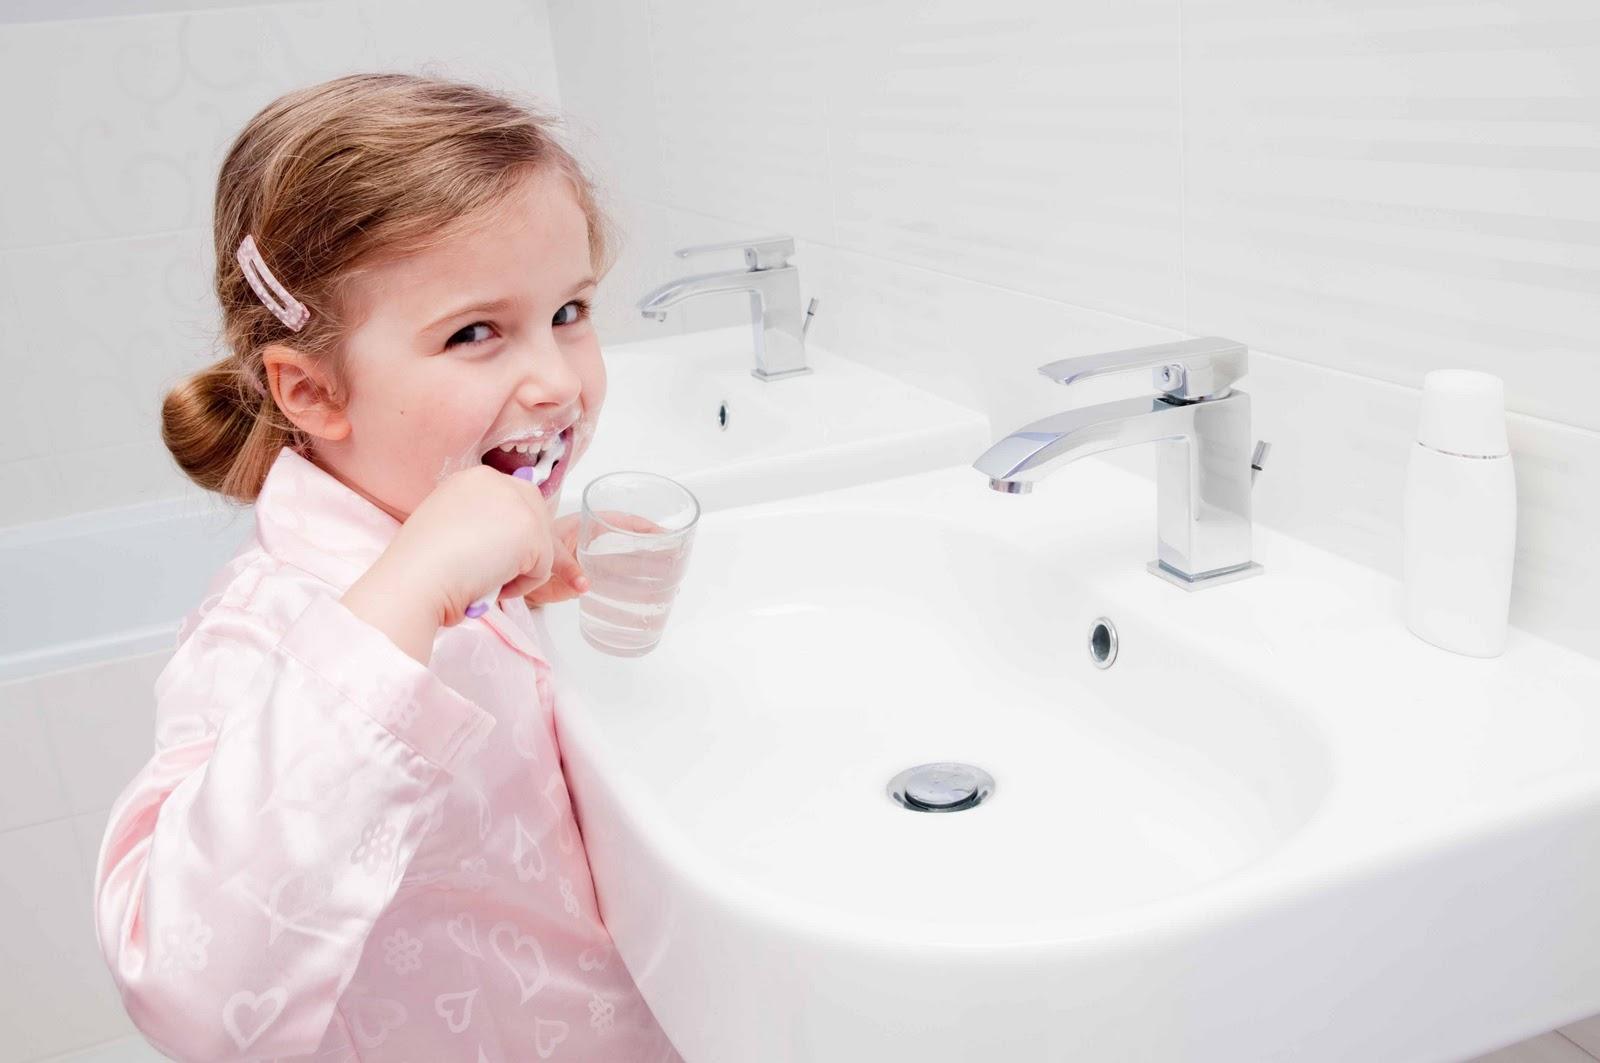 Detr s de cada revista ahorrar agua en casa for Llave de regadera no cierra